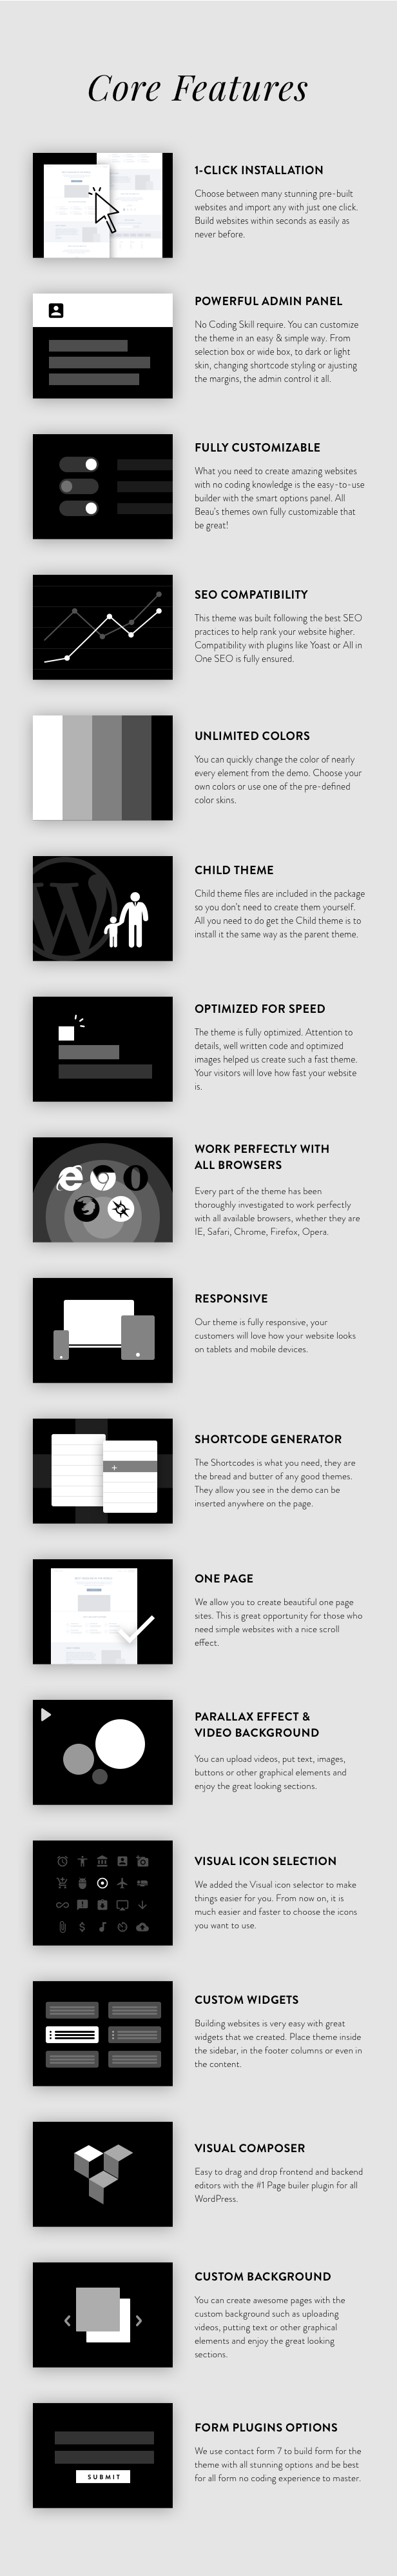 FilmMaker WordPress Theme: Film Studio - Movie Production - Video Blogger - Creative Agency 10